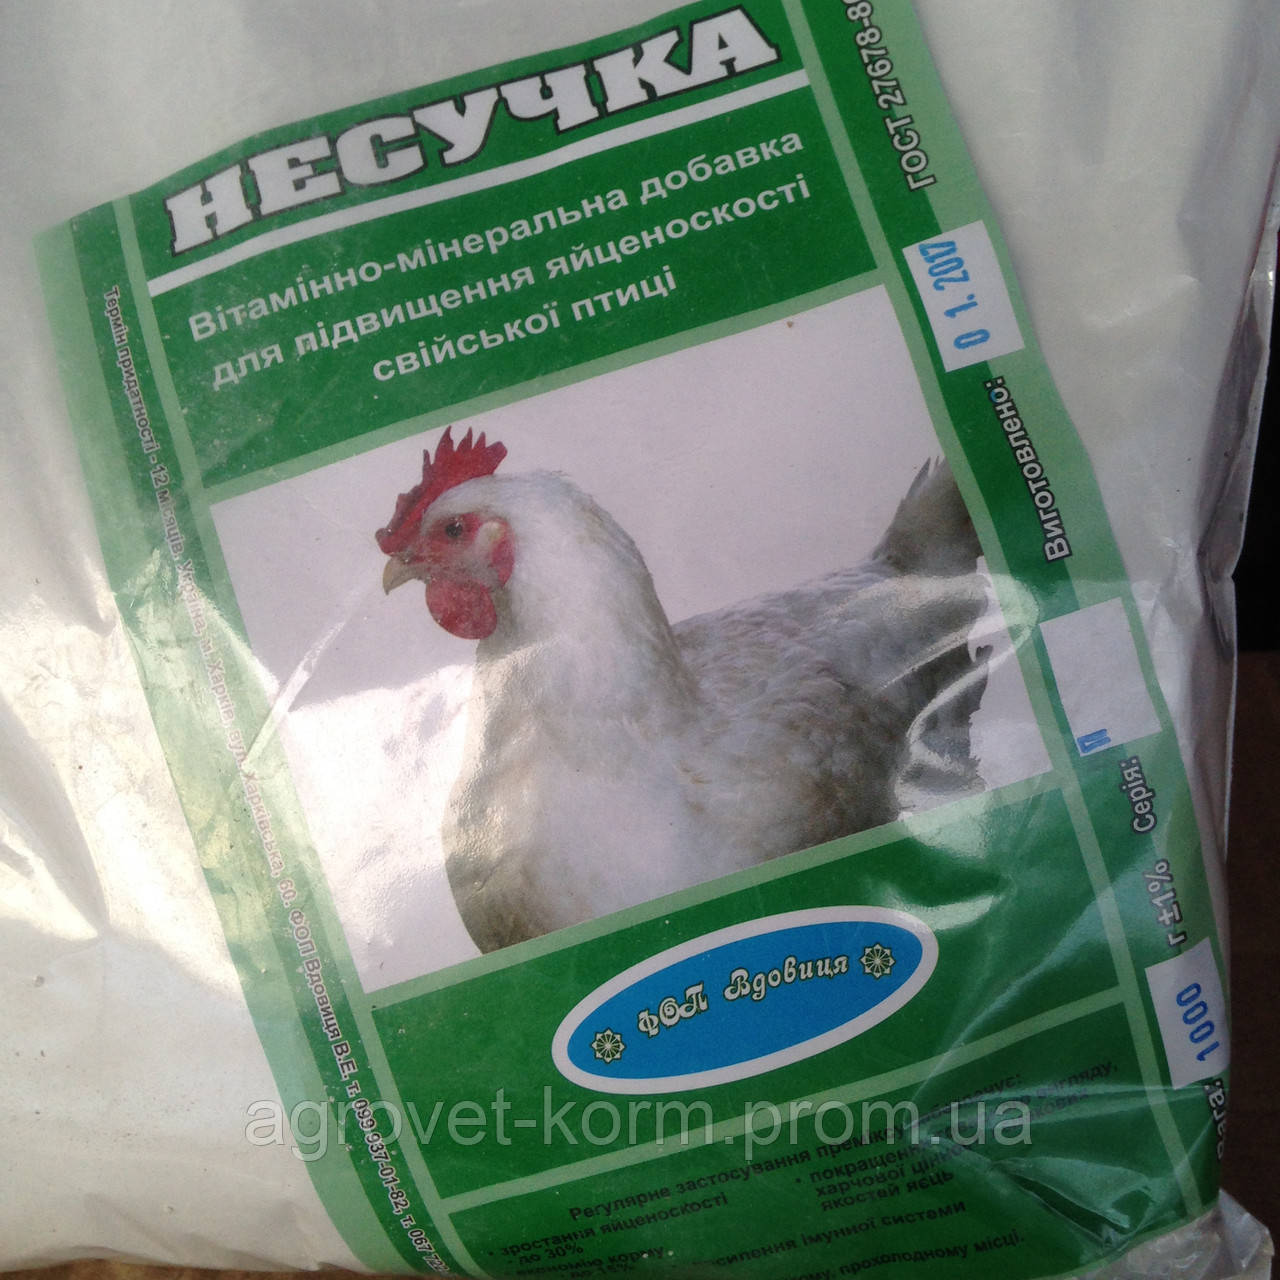 Премікс для кур, 0,5 кг.